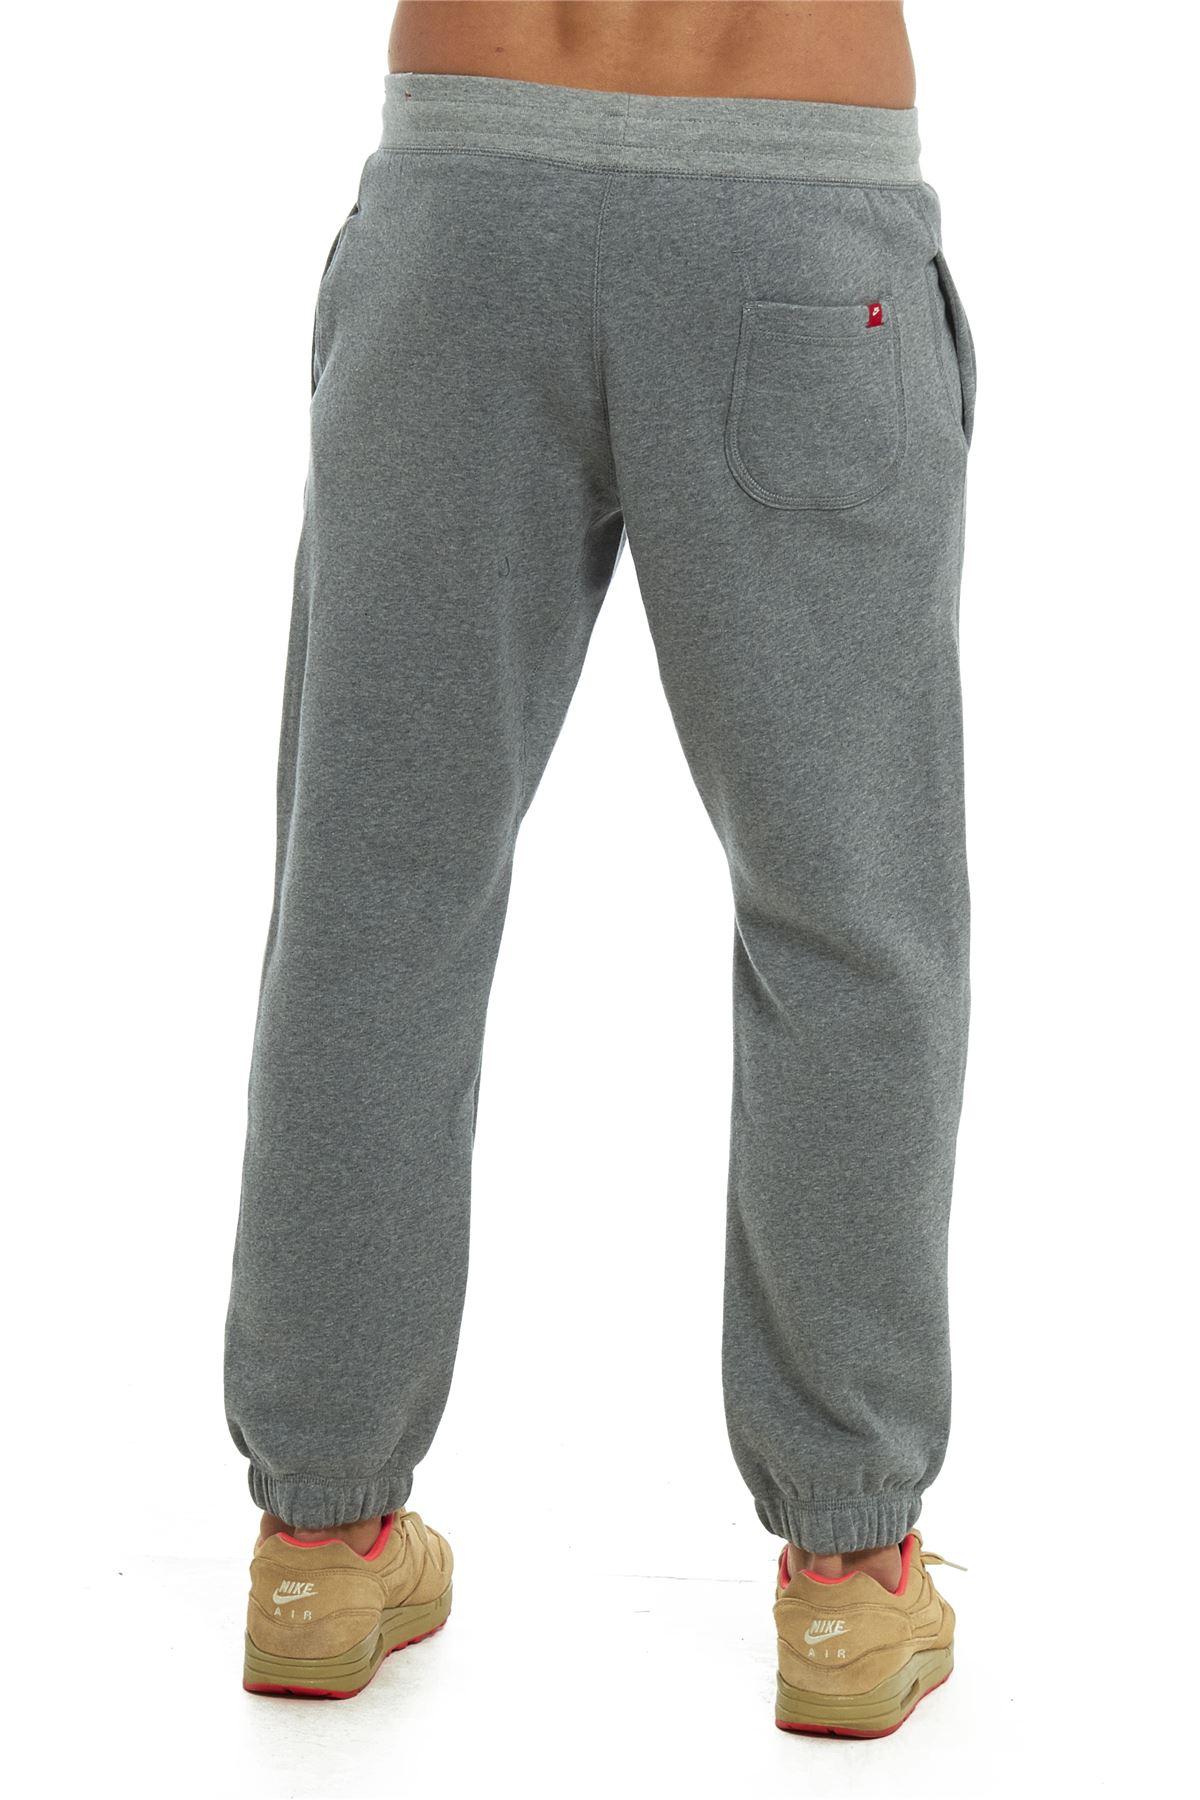 Nike Joggers Mens Jogging Bottoms Sweatpants Small Medium ...